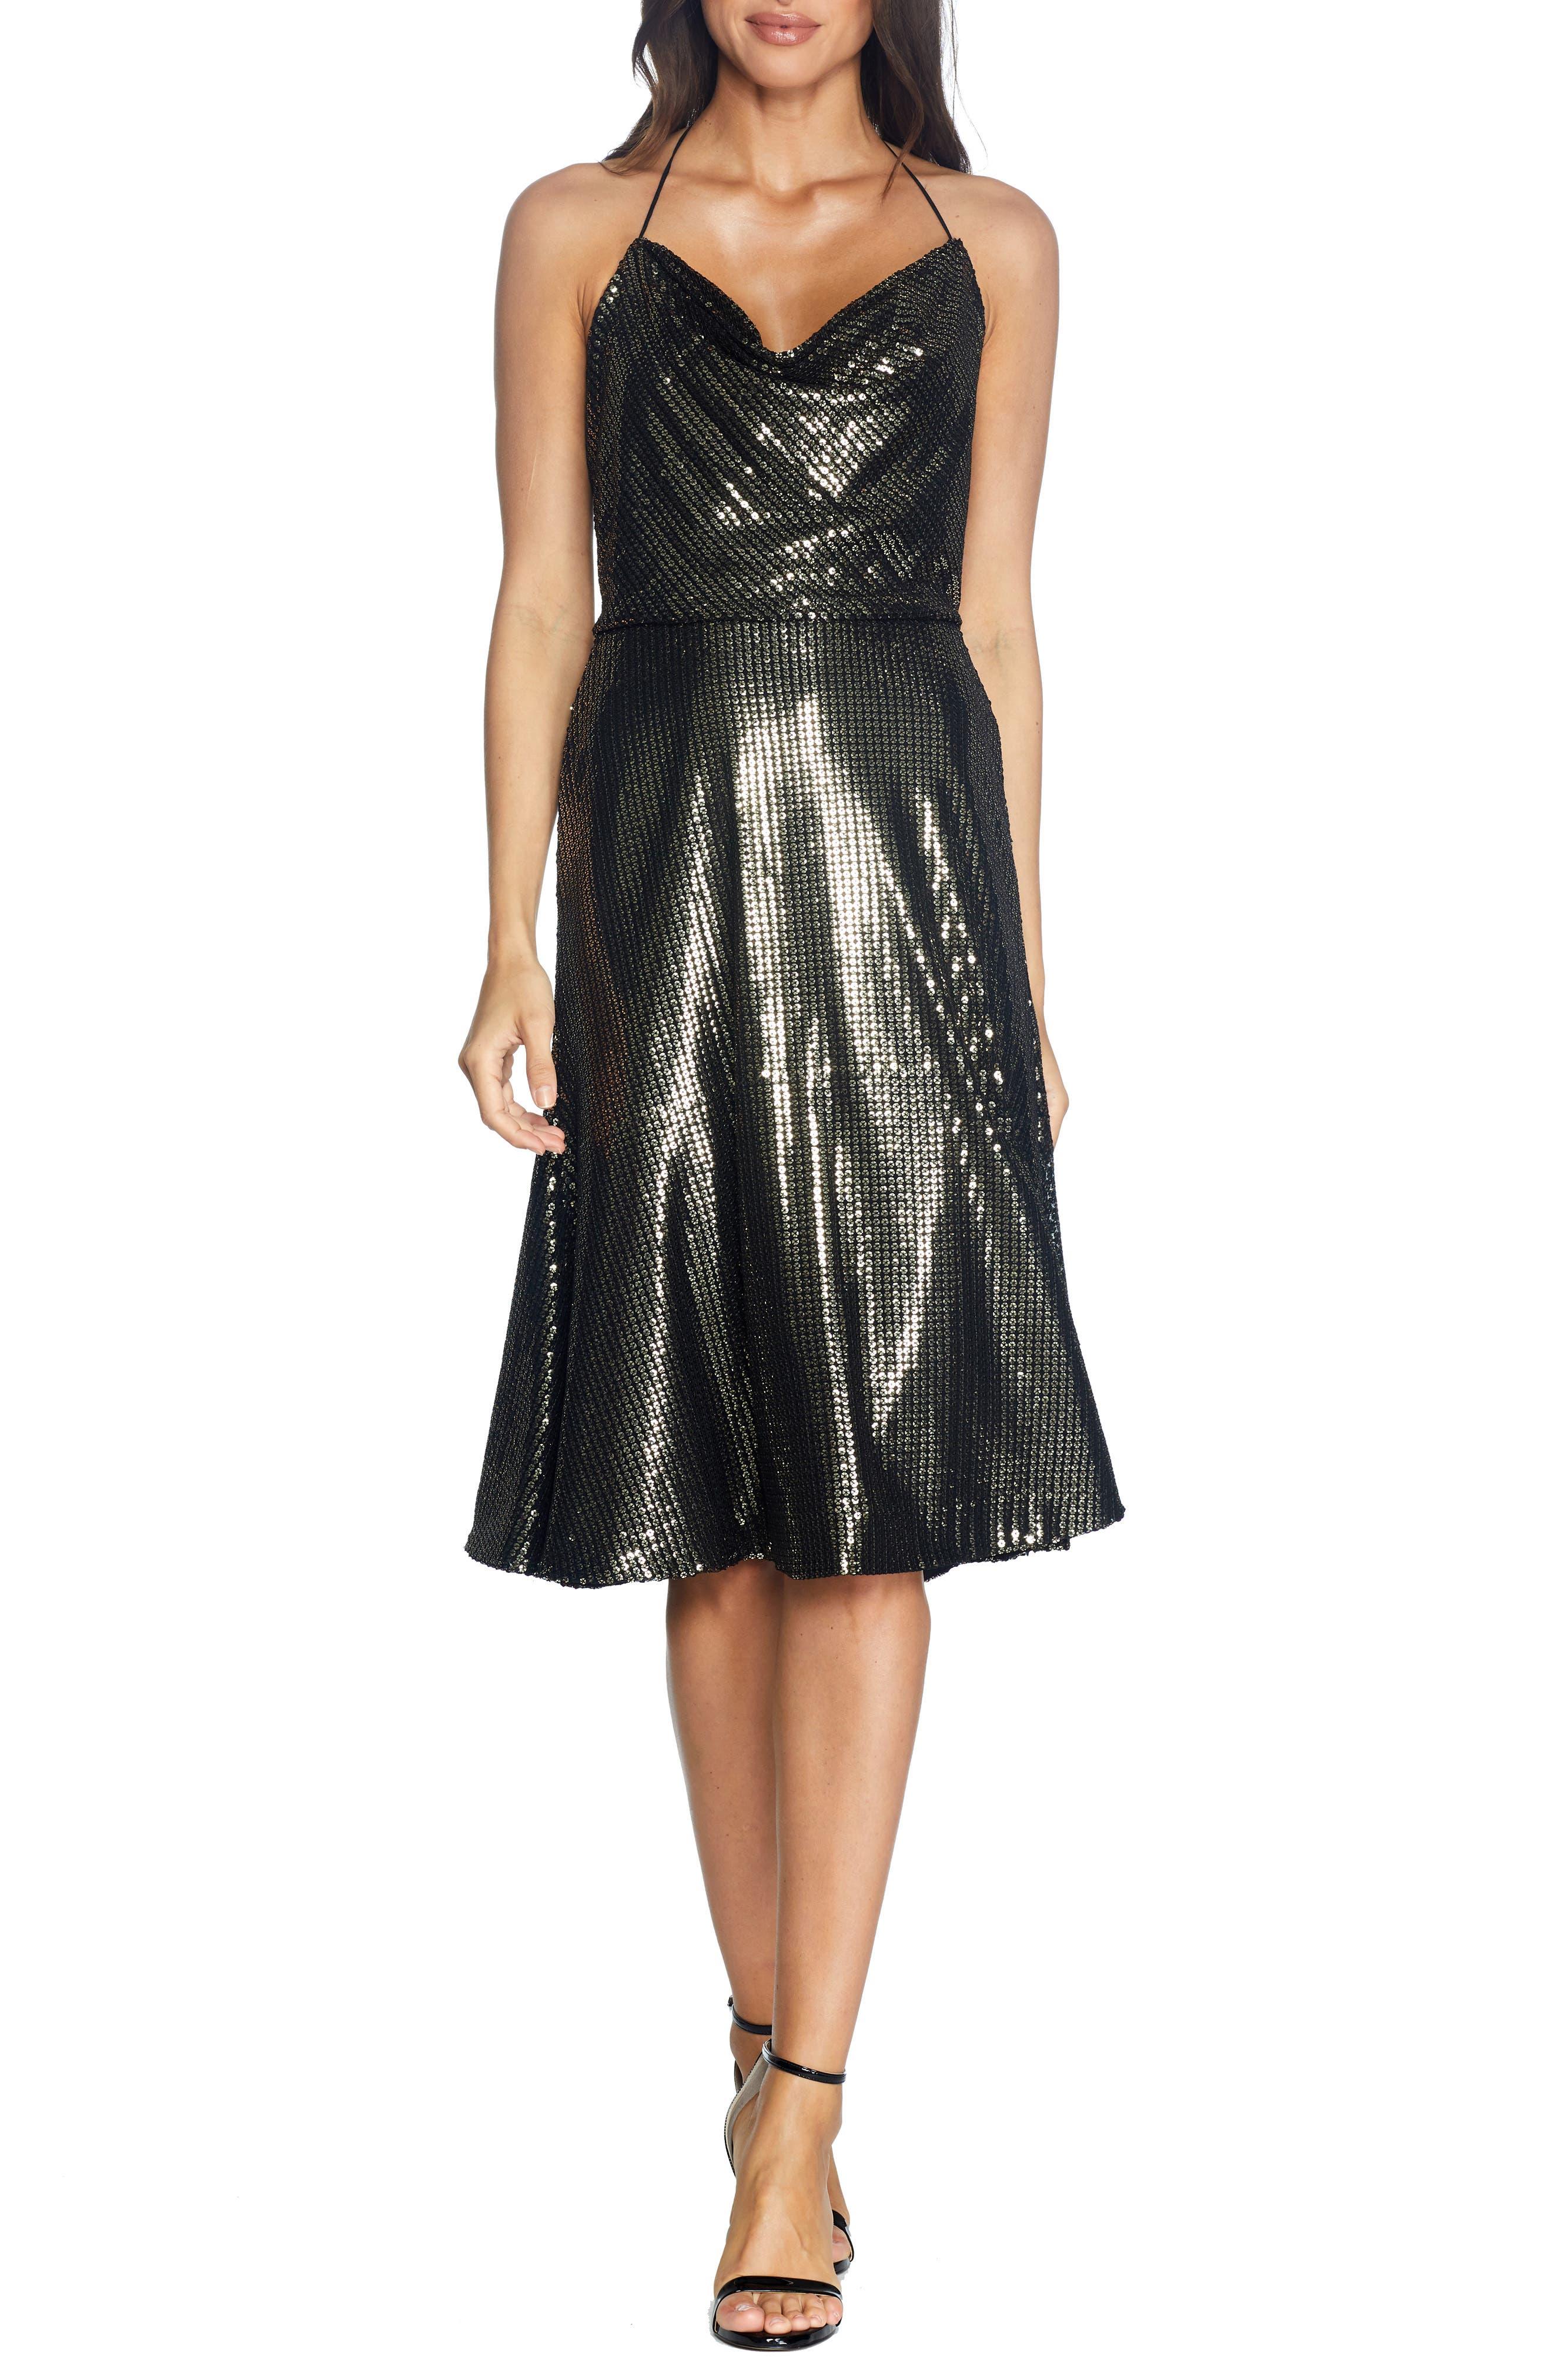 70s Prom, Formal, Evening, Party Dresses Womens Dress The Population Zherra Sequin Midi Dress Size XX-Small - Black $258.00 AT vintagedancer.com